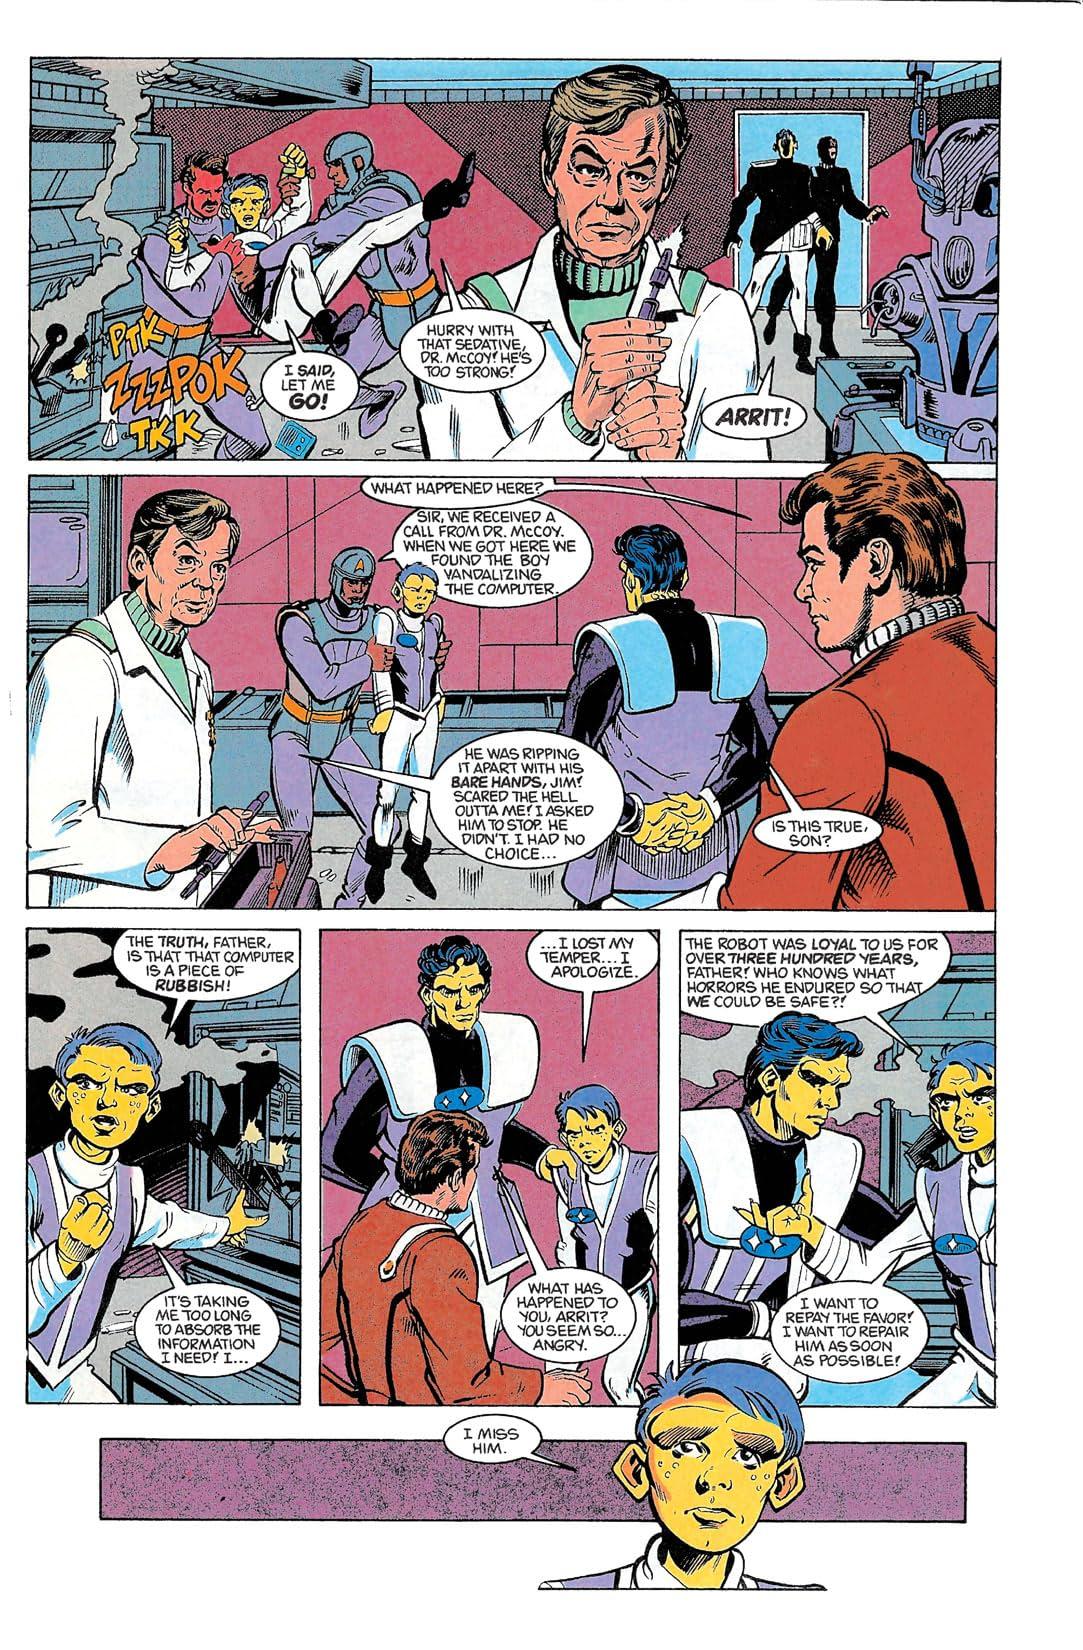 Star Trek Archives: The Best of Peter David #3